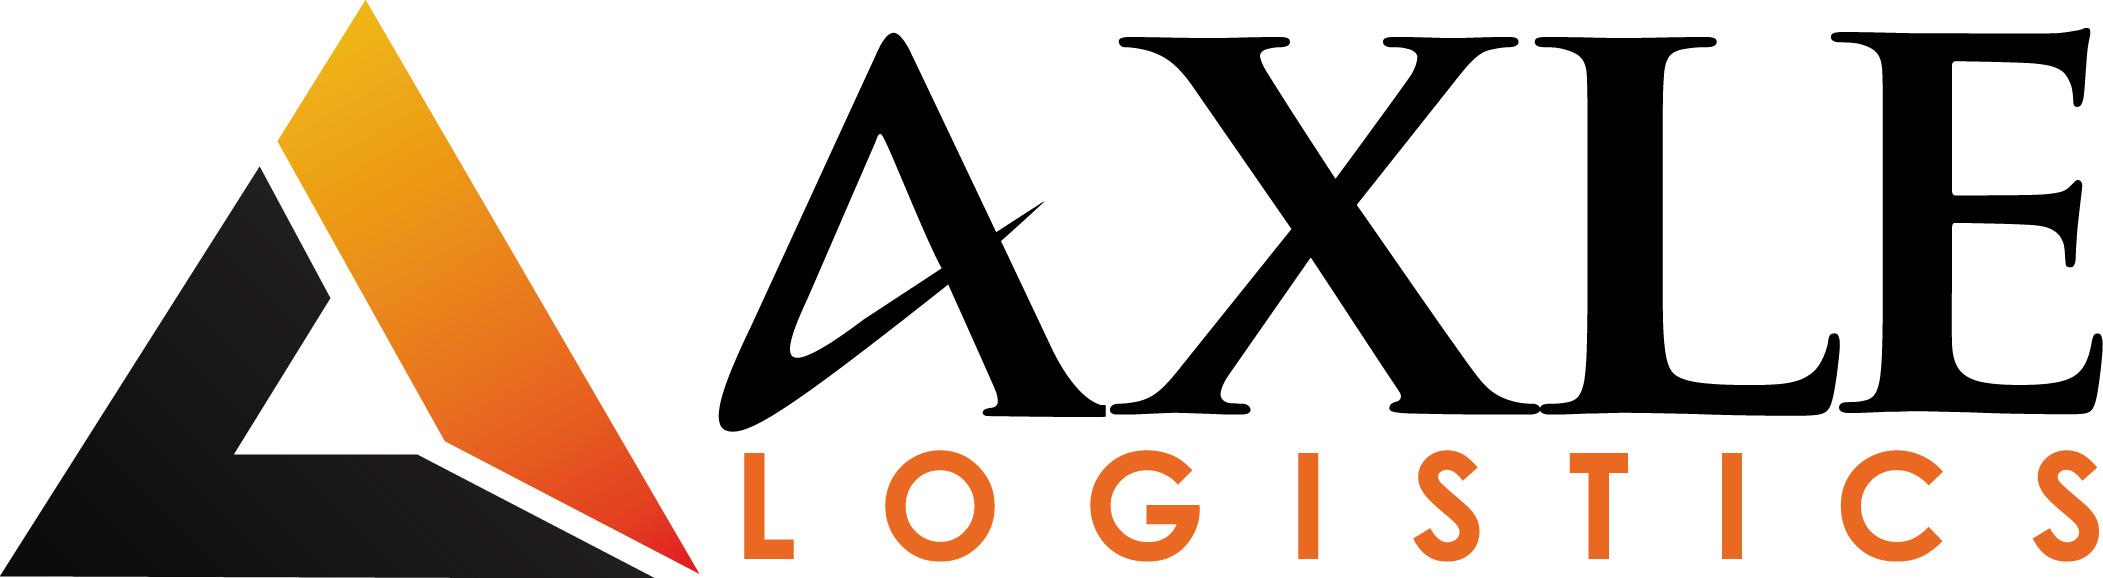 Axle Logistics logo